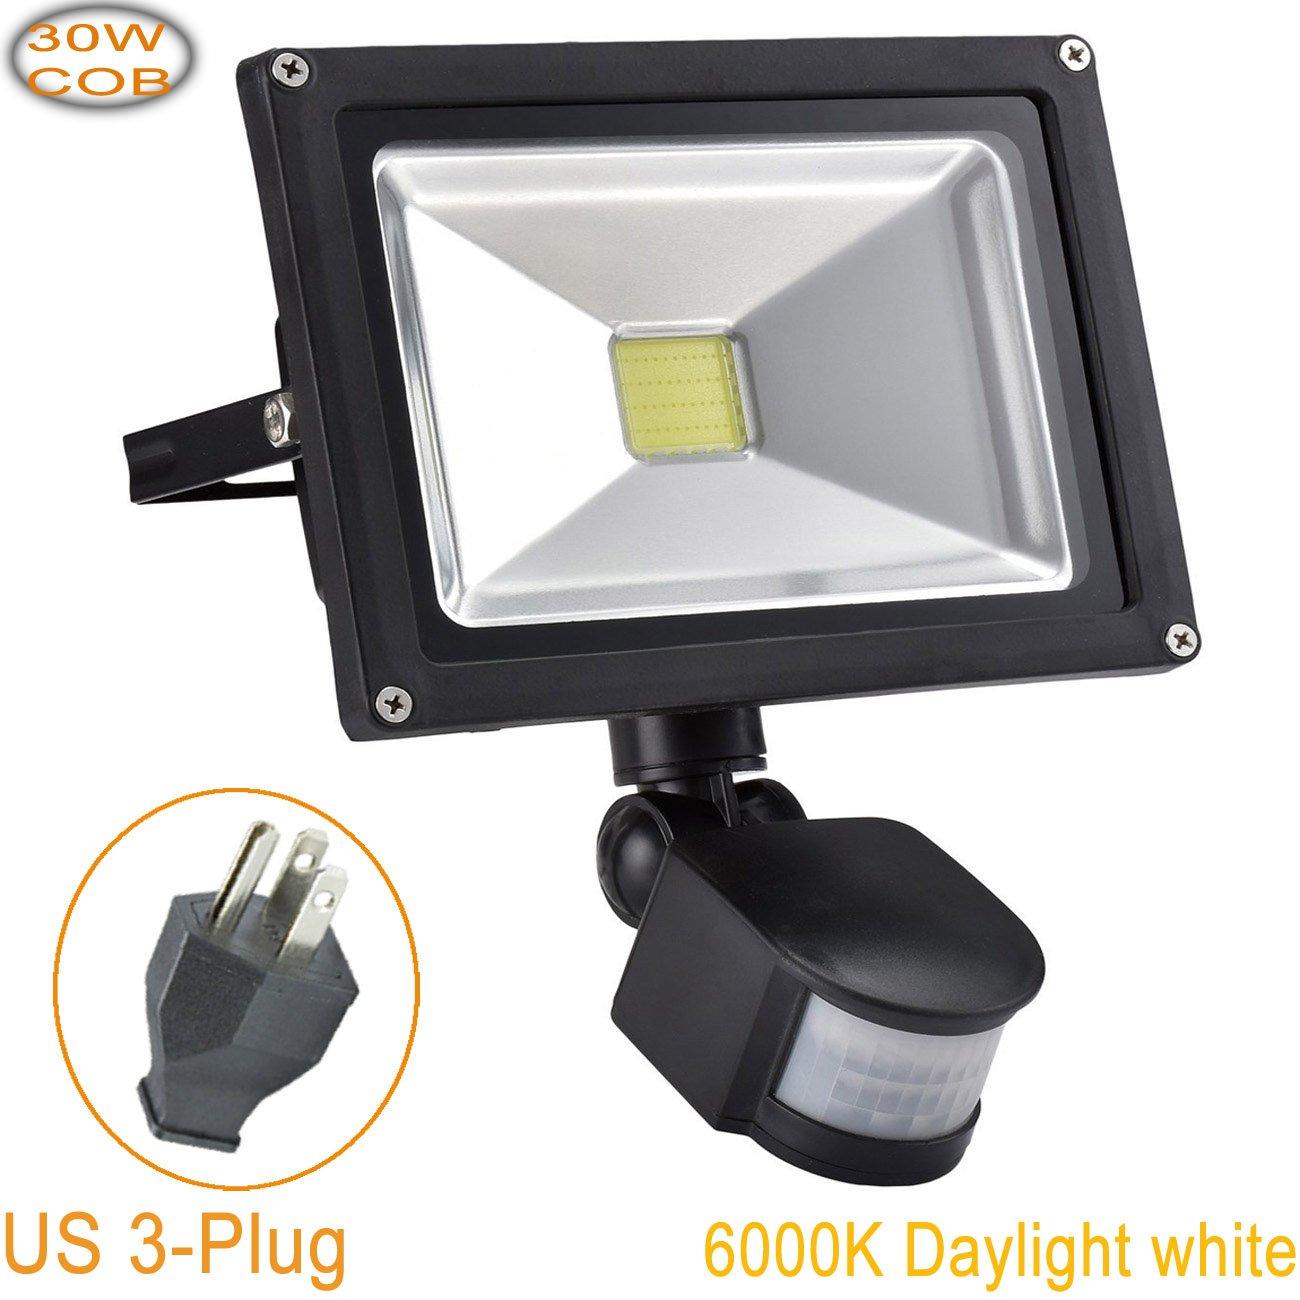 W-LITE 30W Led Motion Sensor Flood Lights Outdoor, PIR Induction Lamp, Intelligent Light, 6000K, Cool White, 240W Bulb Equivalent, 2400lm, Super Bright Waterproof Security Floodlight